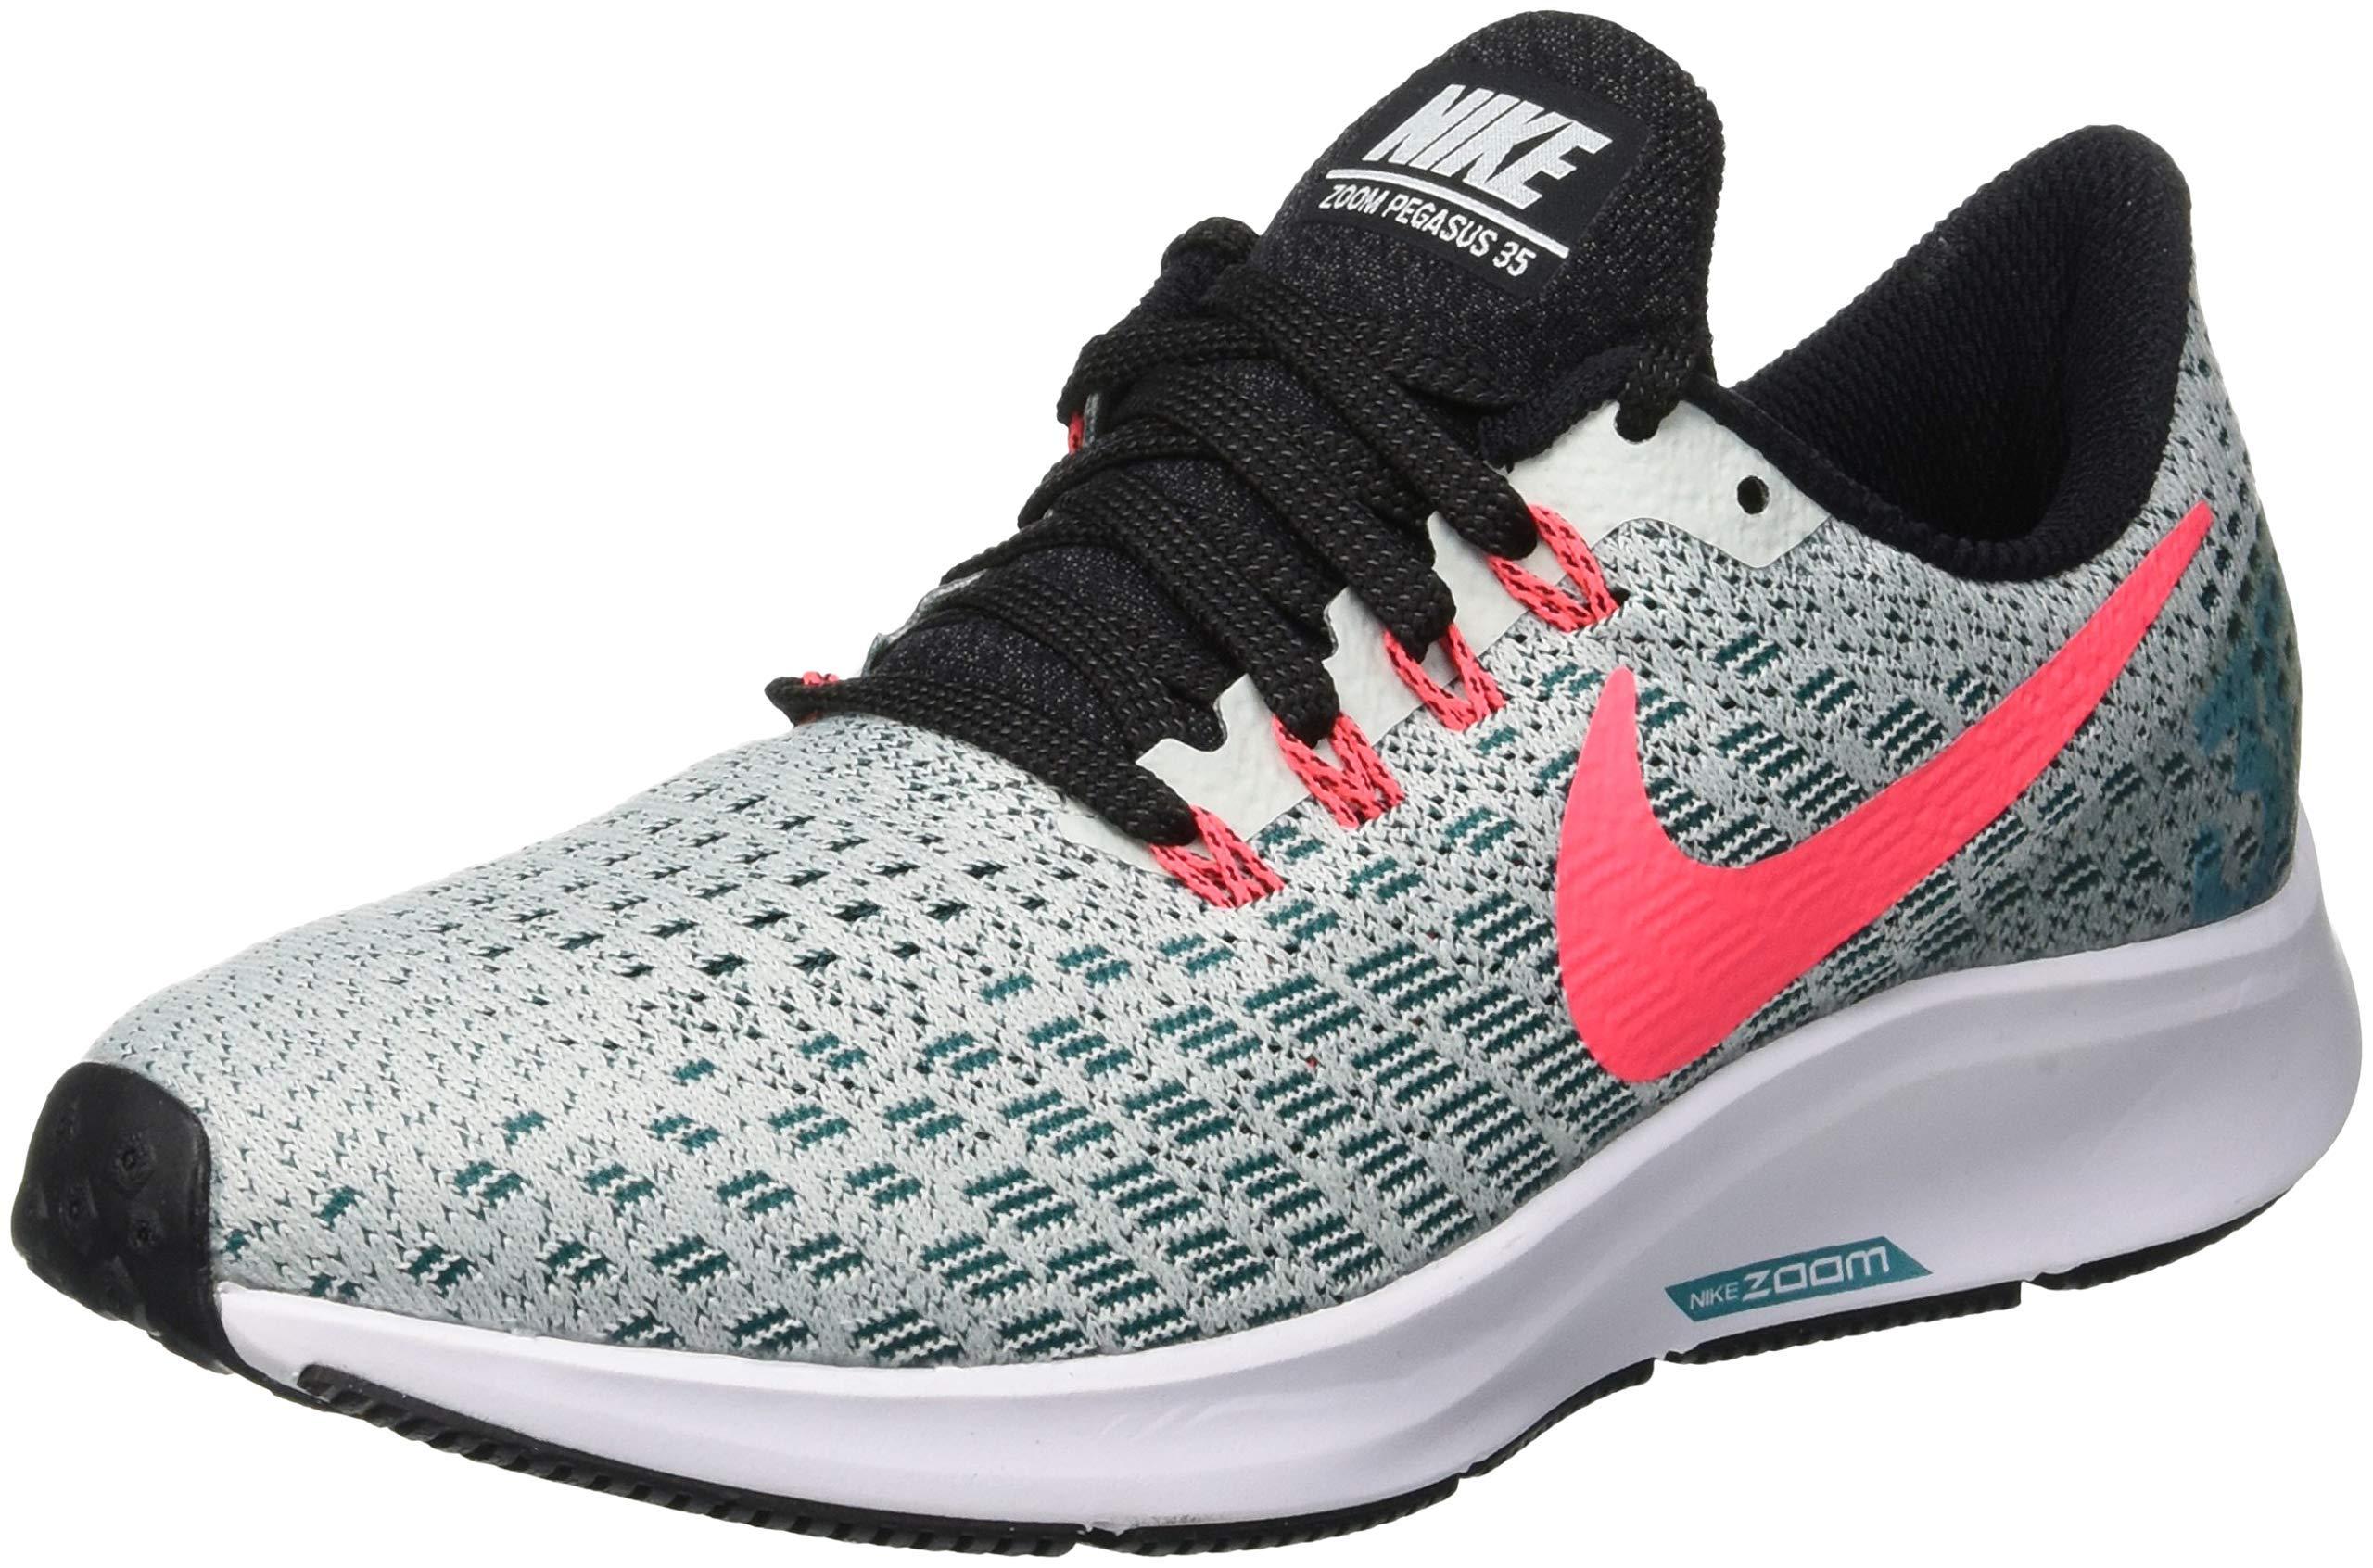 Nike Air Zoom Pegasus 35, Women's Running, Multicolored (Barely Grey/Hot Punch/Geode Teal/Black 009), 4 UK (EU) by Nike (Image #1)